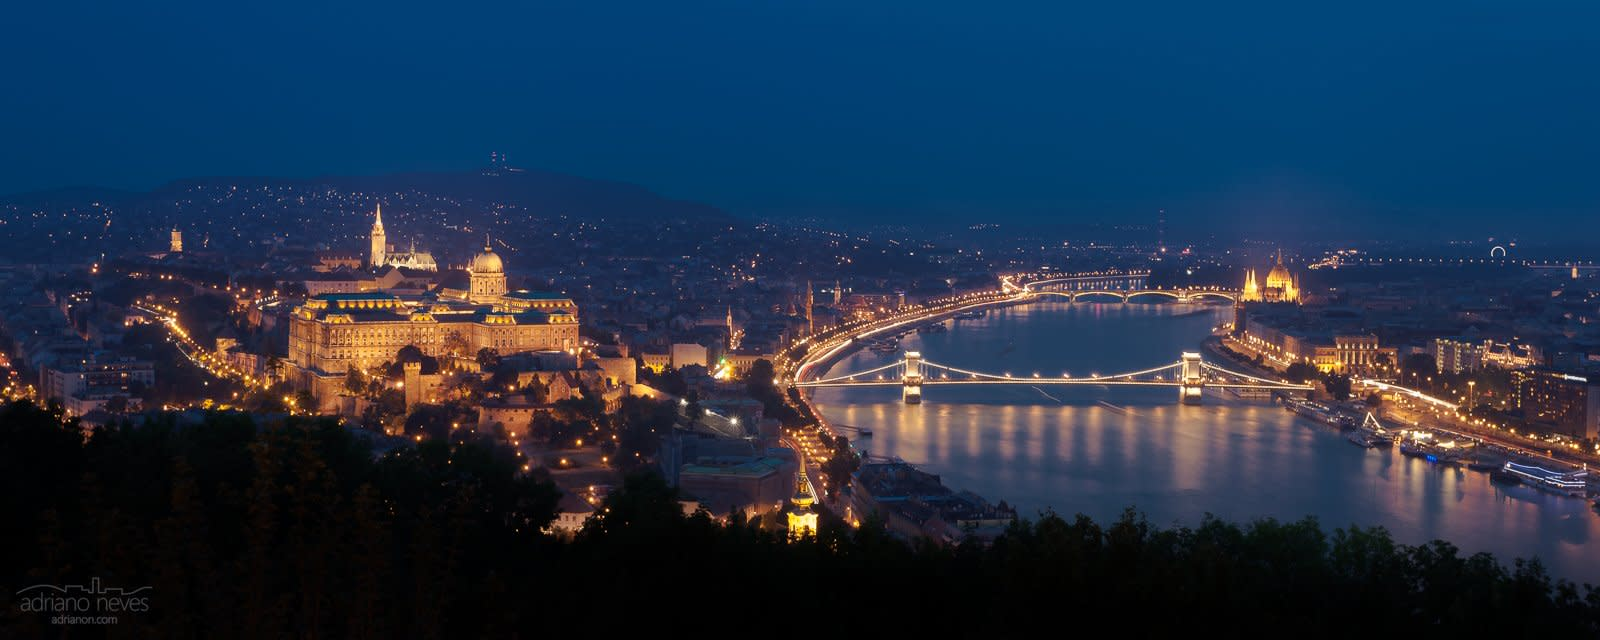 Buda, the Danube & Pest by Dusk Panorama - Hungary, Budapest